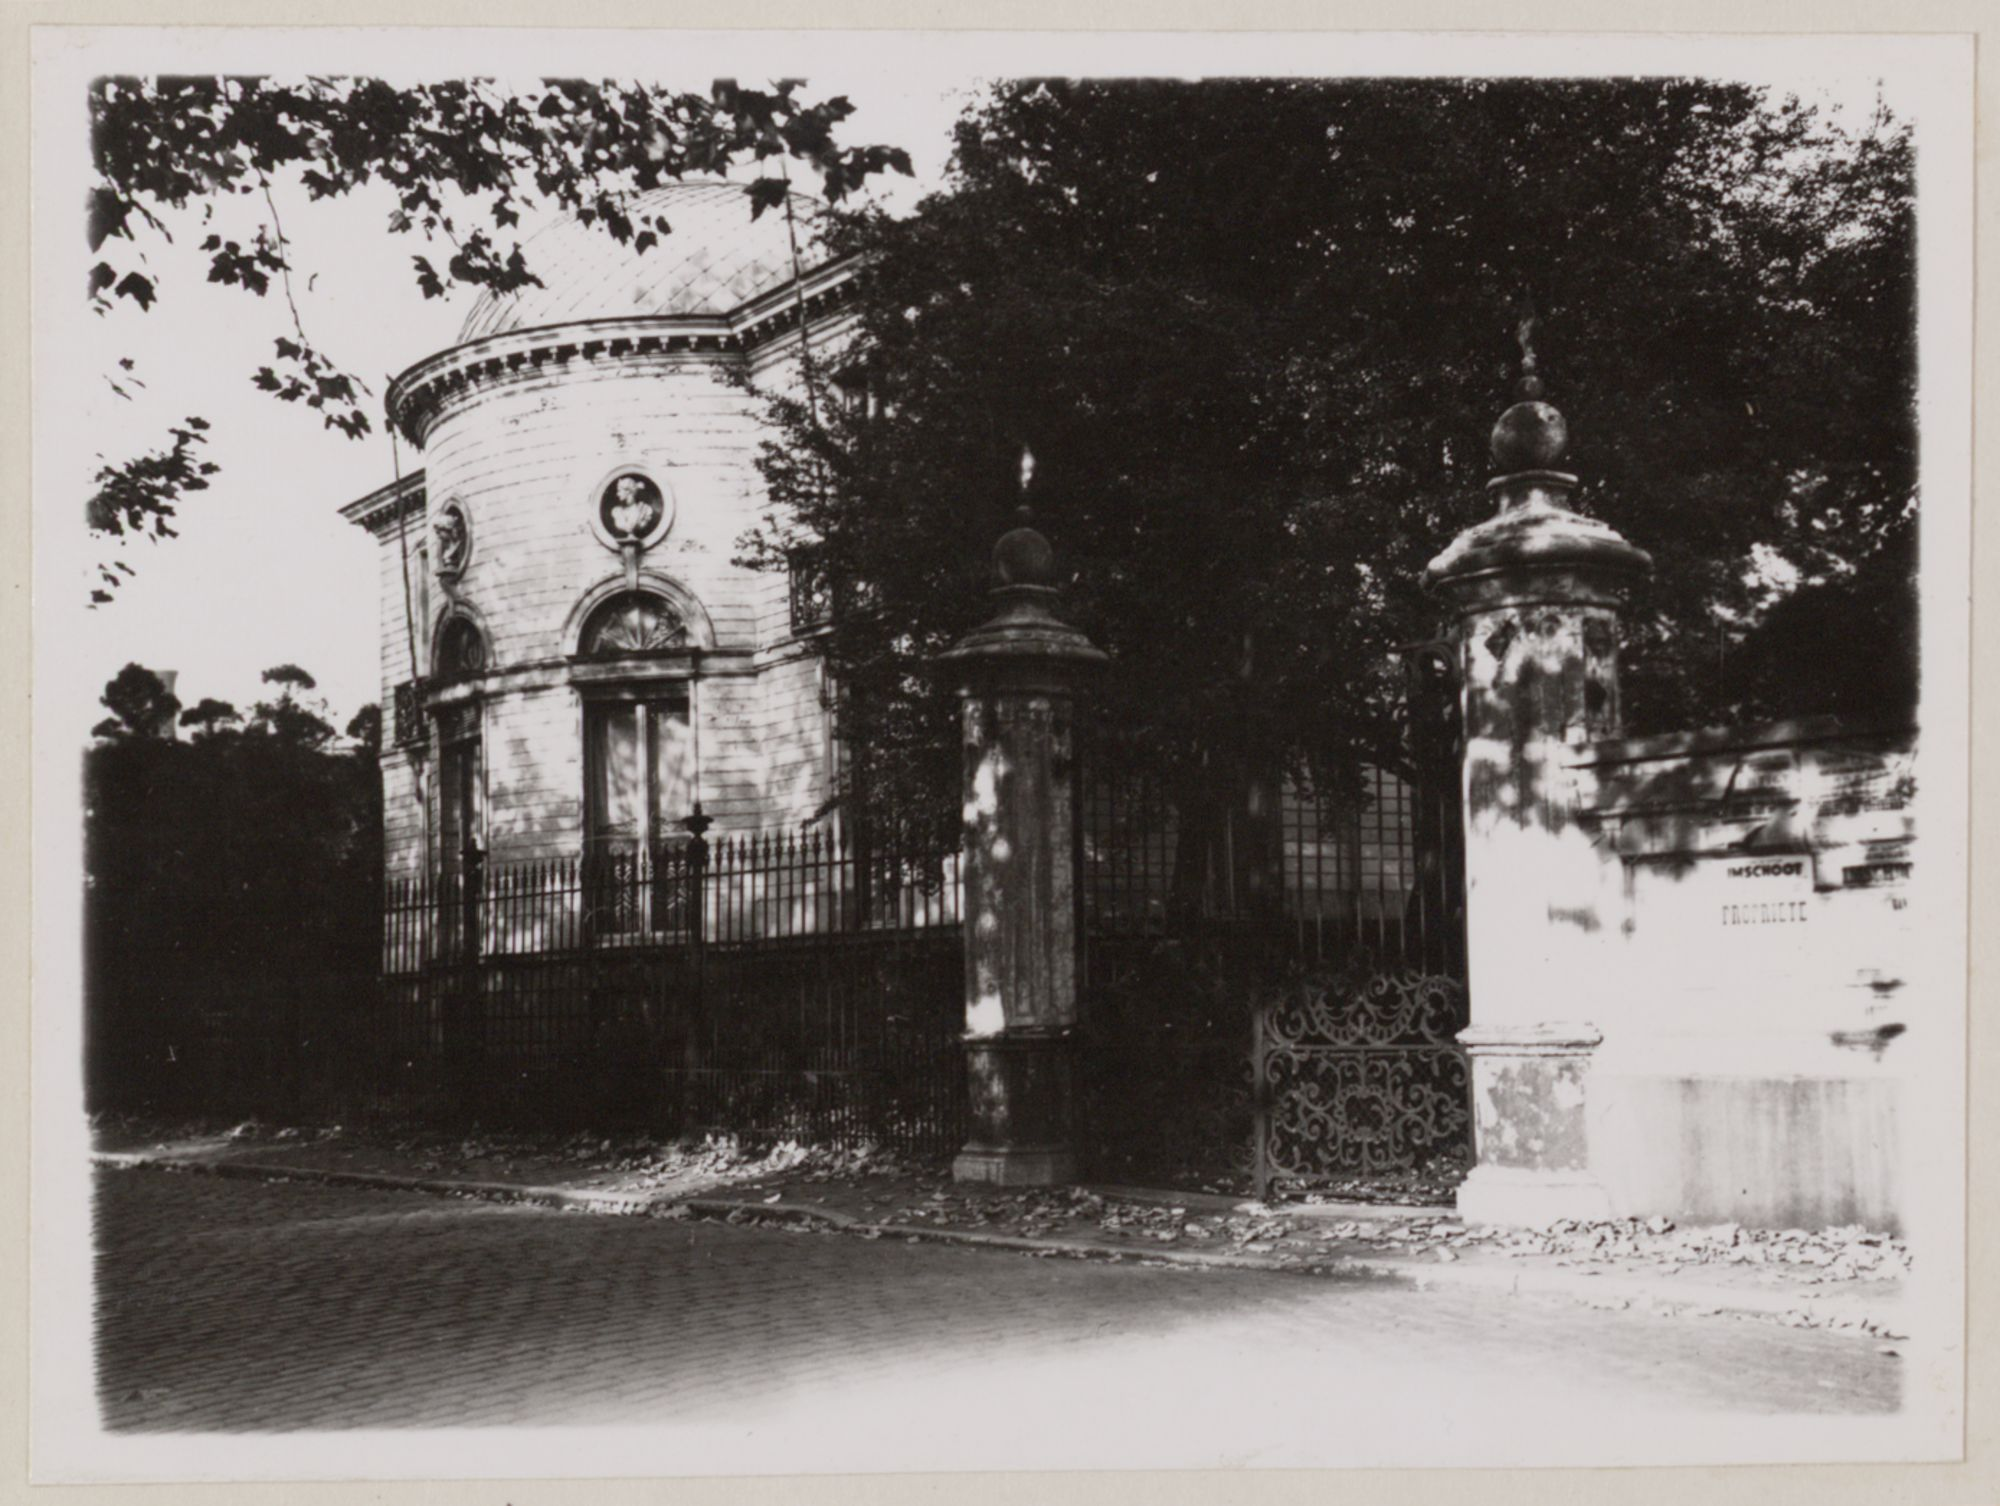 Gent: Huis De Groote, Ferdinand Lousbergskaai